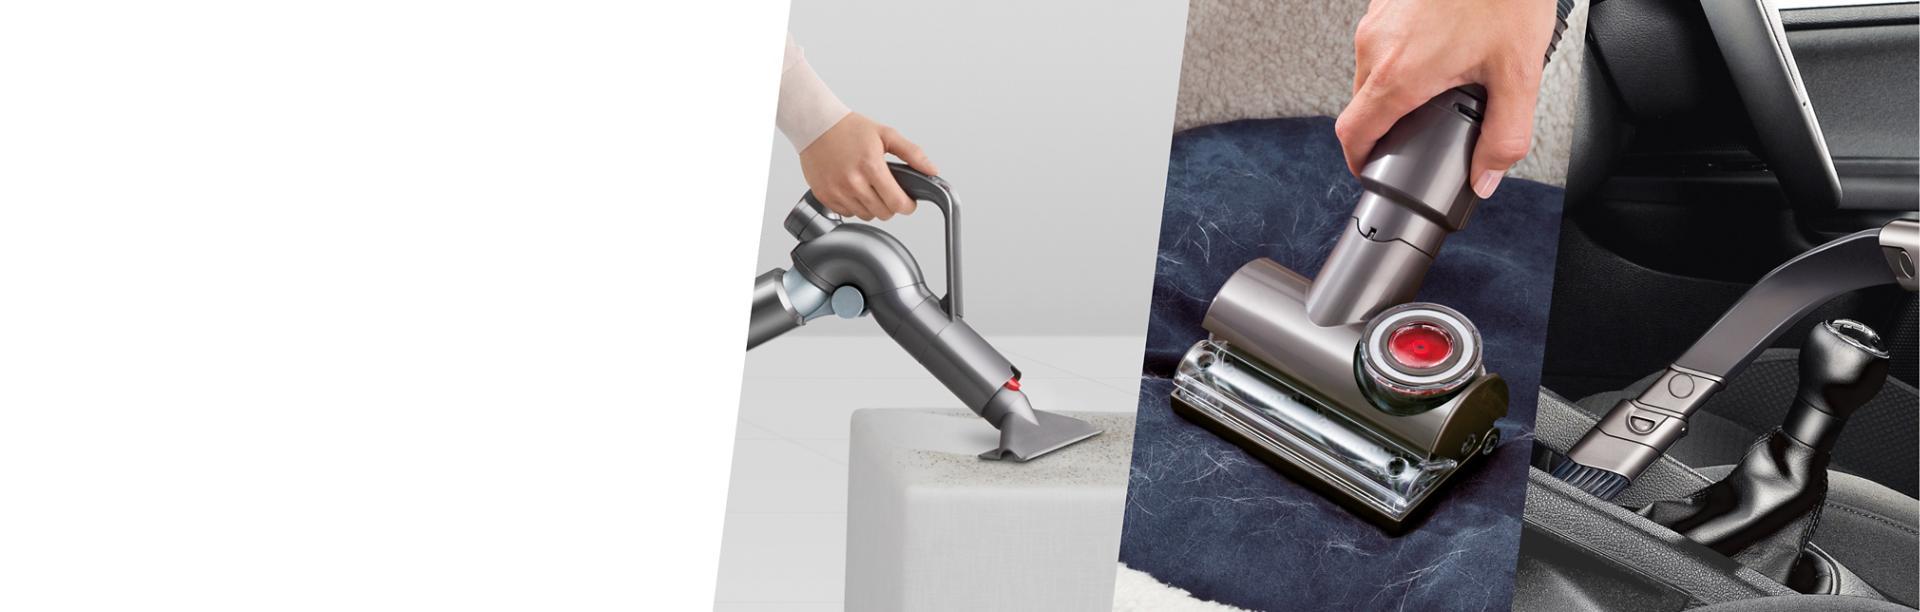 Dyson vacuum accessories